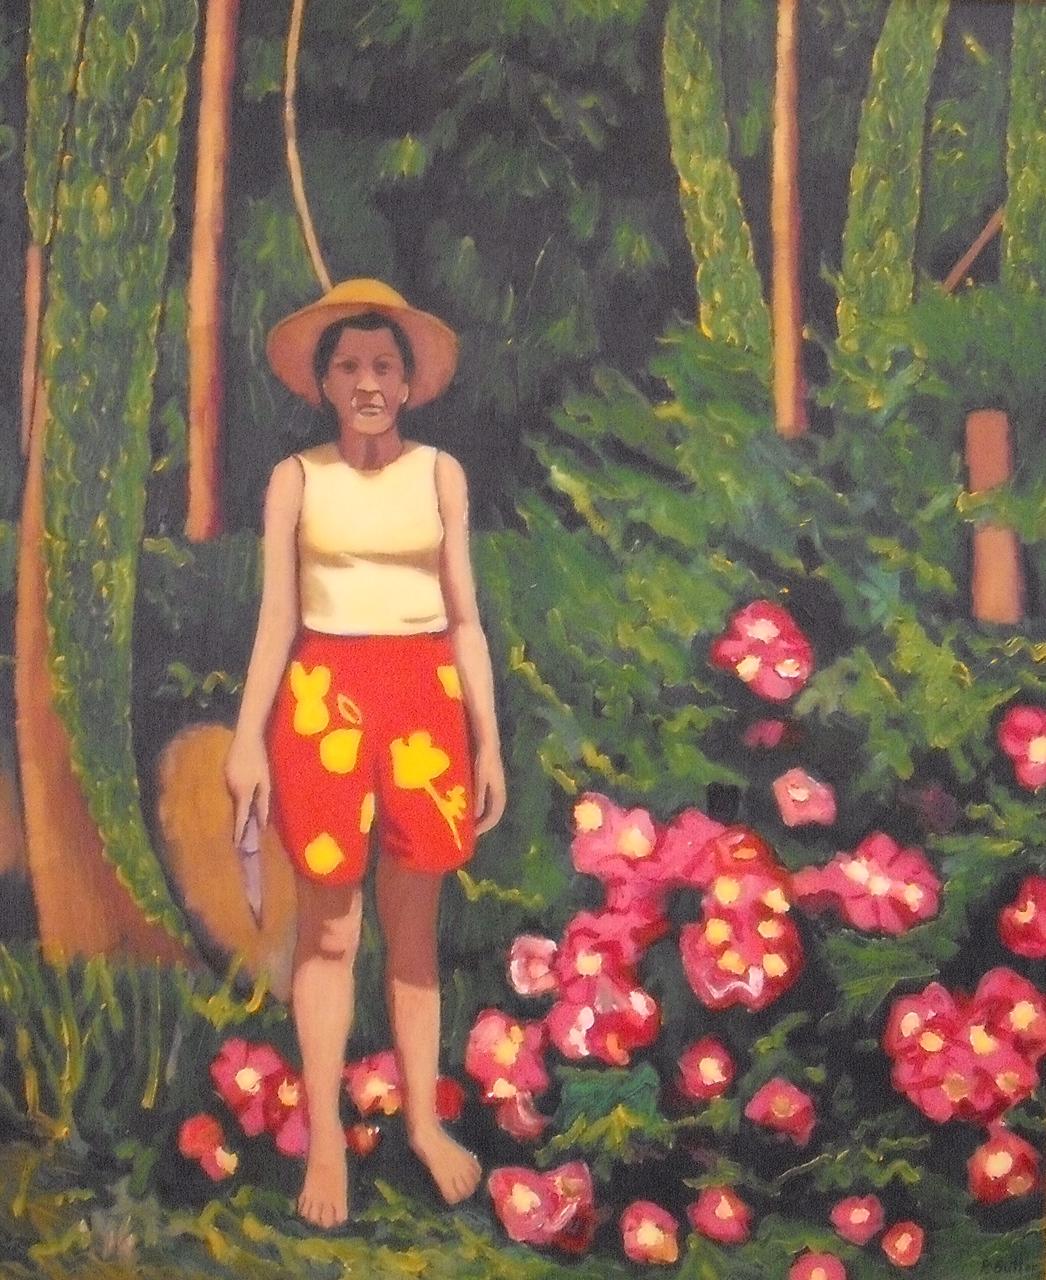 Evelyn in the Garden